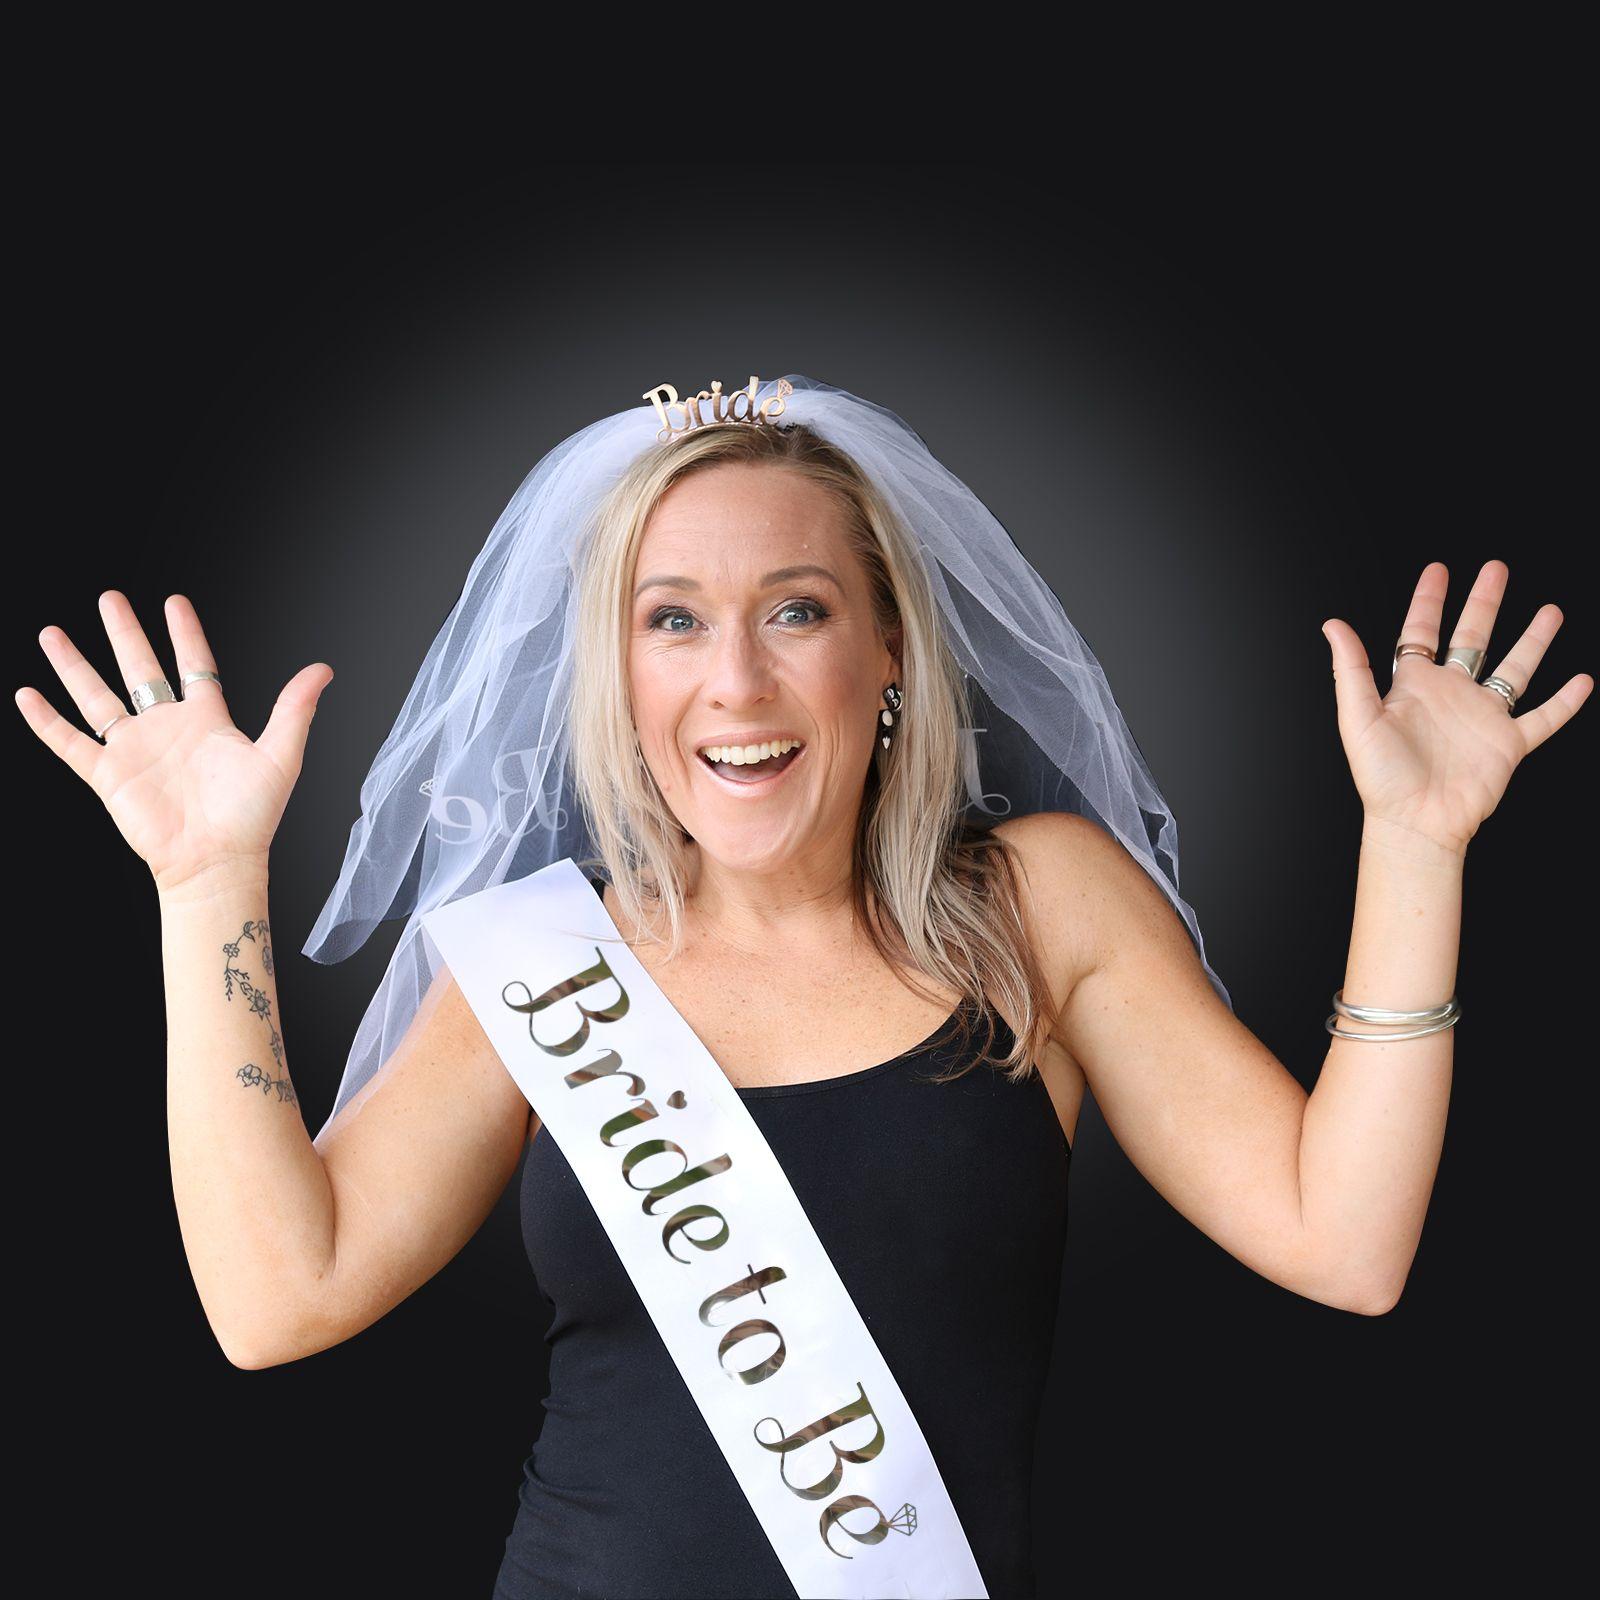 TEAM BRIDE HEN PARTY NIGHT DO BRIDE TO BE SASHES VEIL TIARA